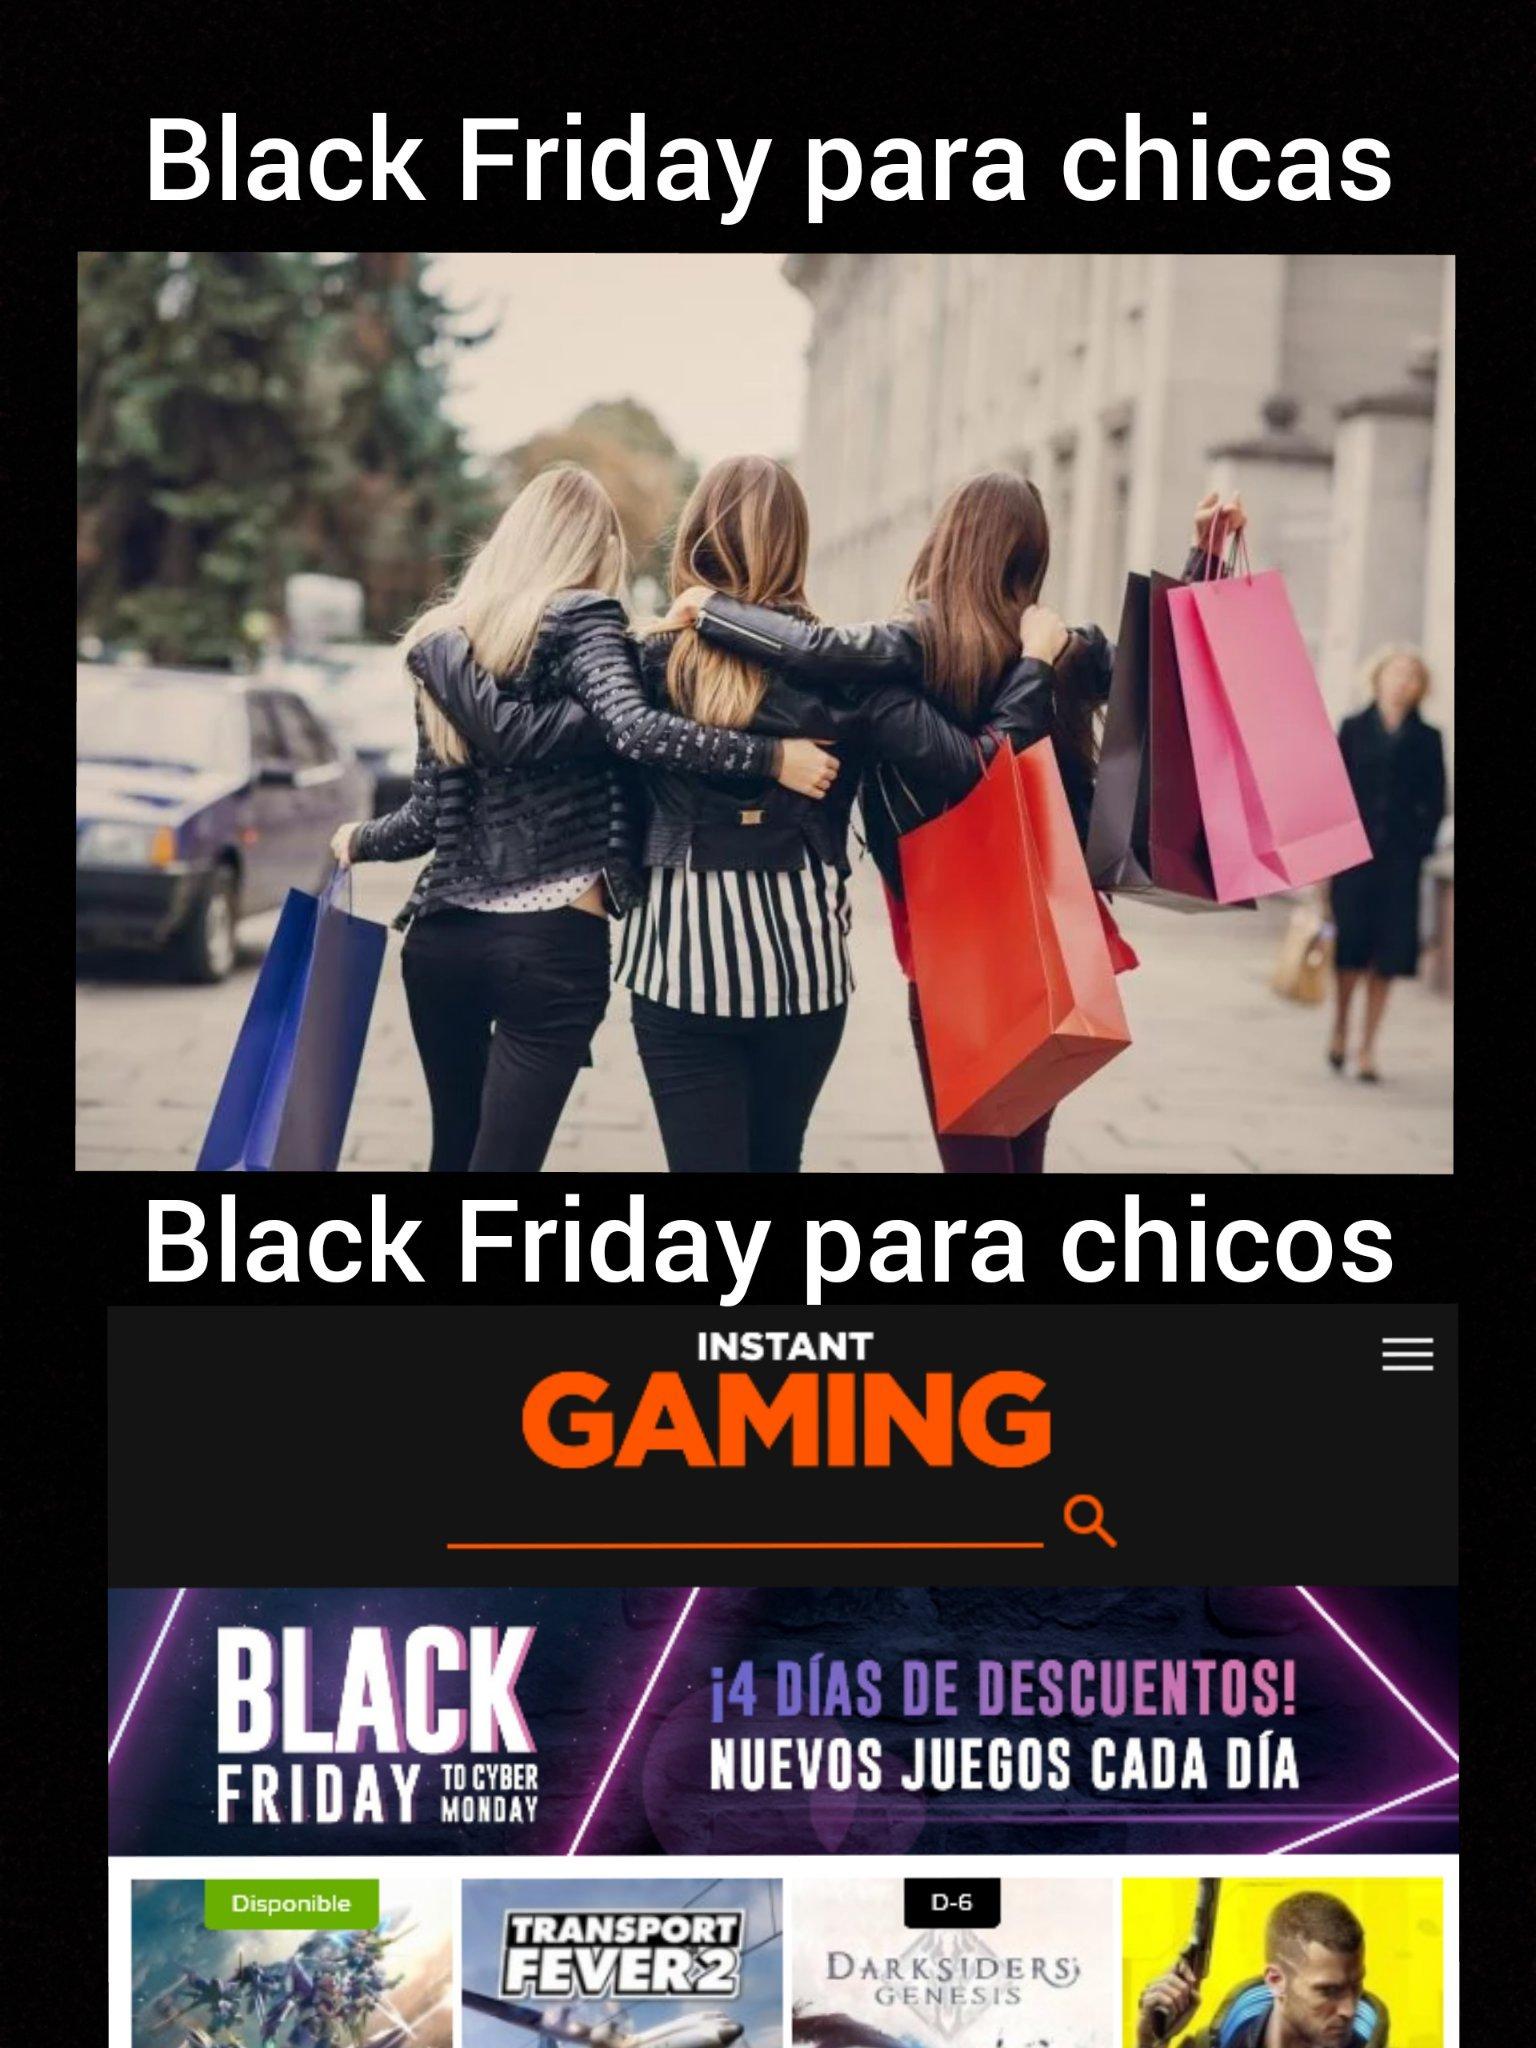 Black Friday Meme By Bonew24 Memedroid